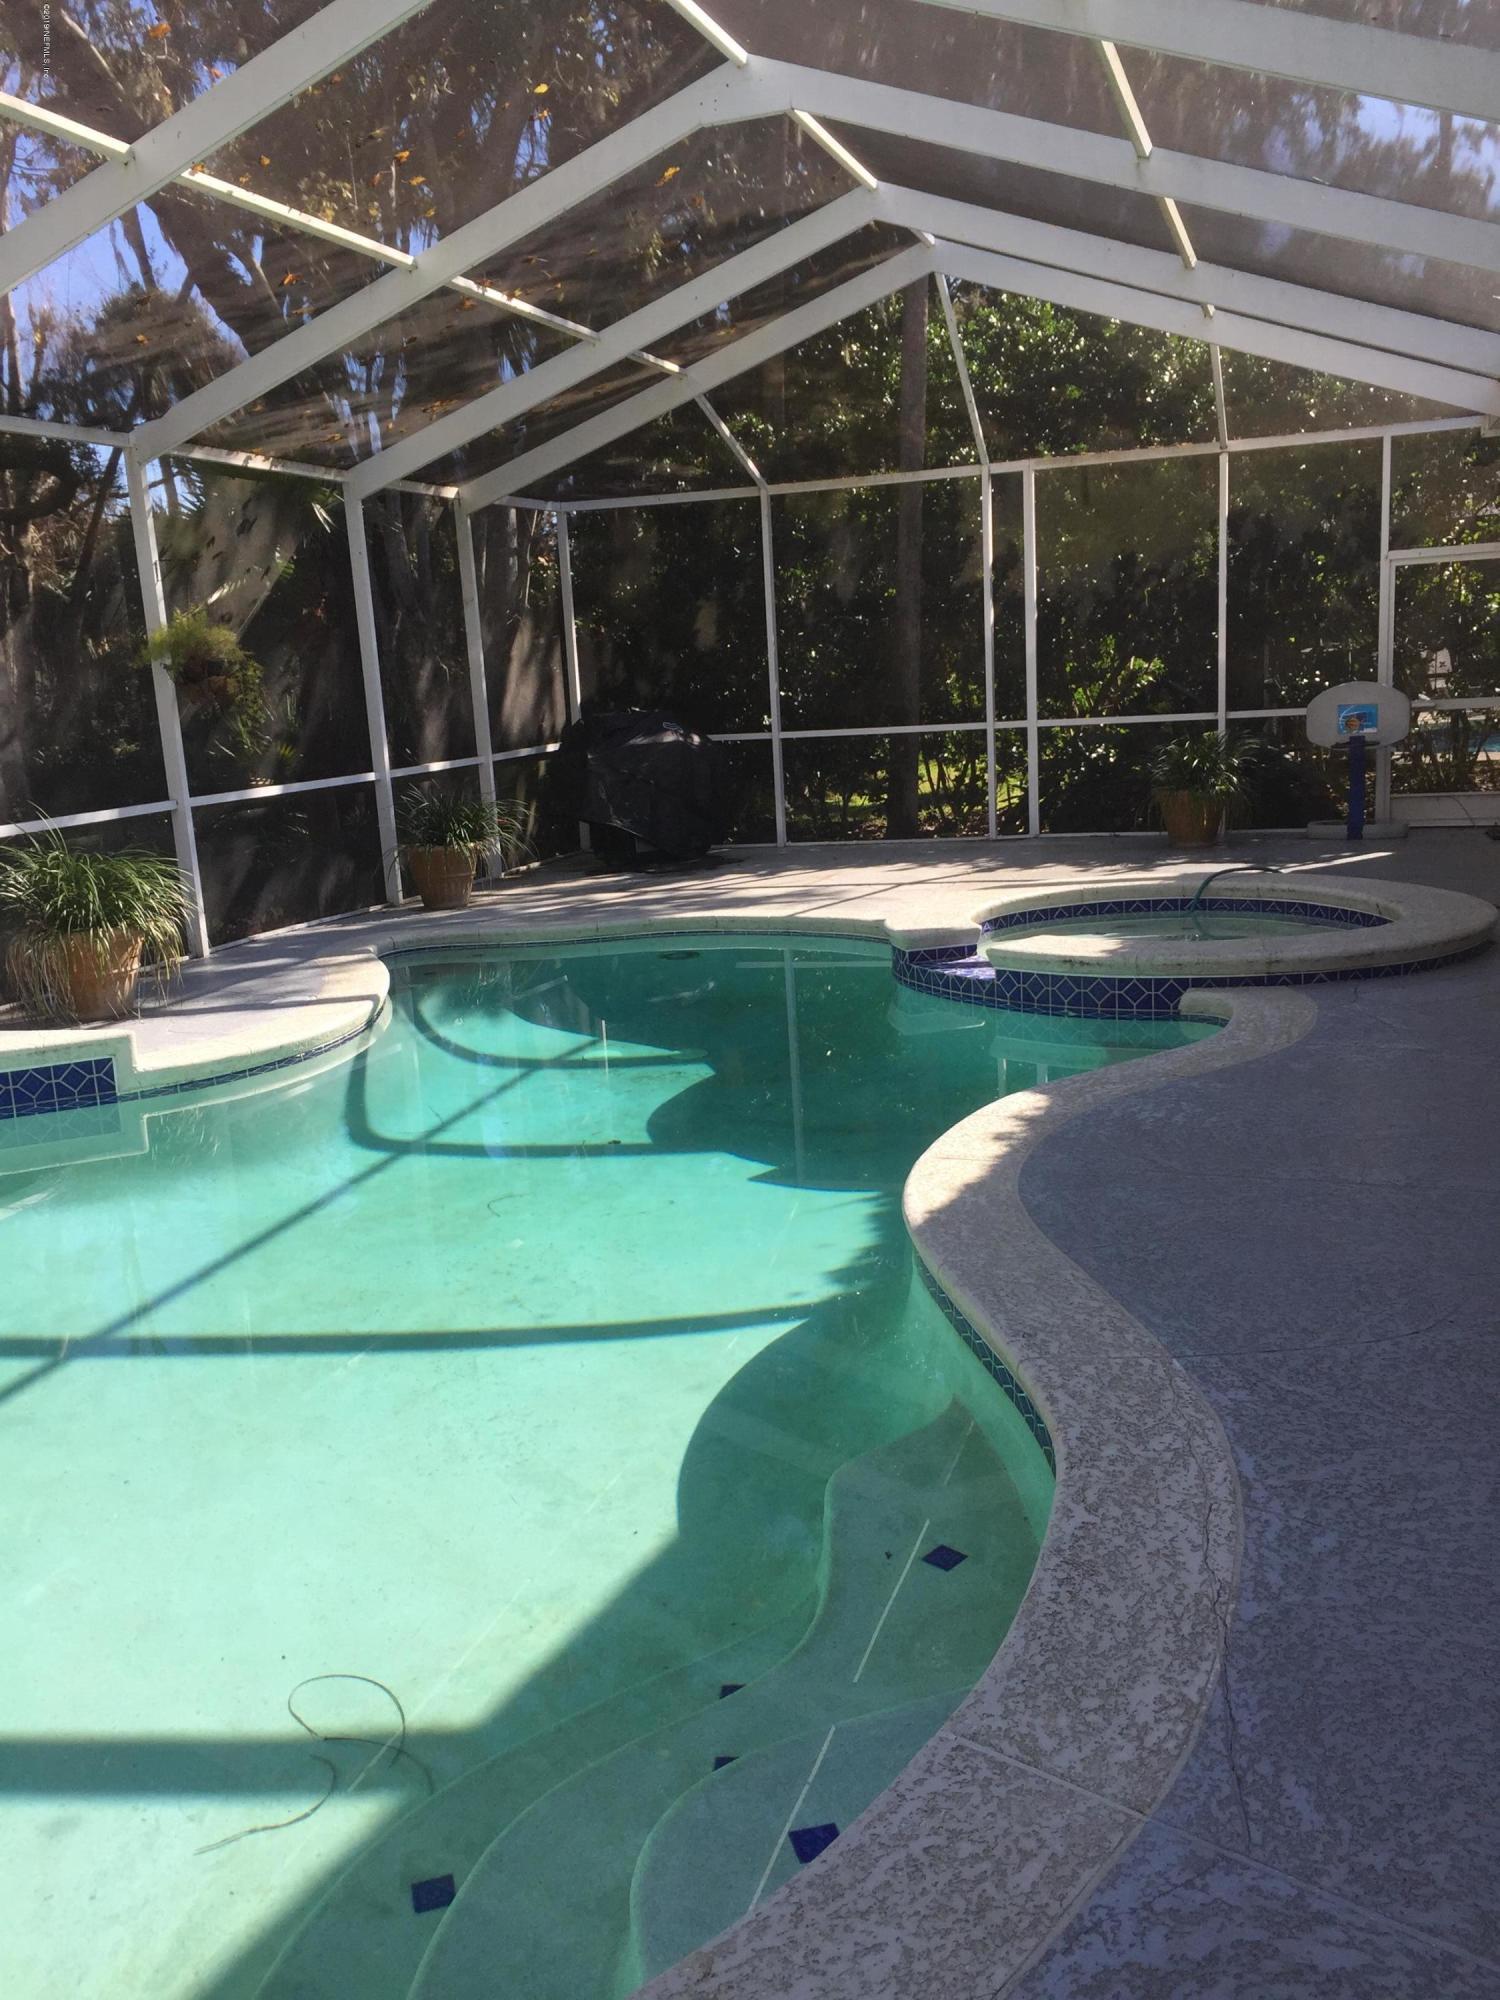 300 LAUDEN, PONTE VEDRA BEACH, FLORIDA 32082, 4 Bedrooms Bedrooms, ,2 BathroomsBathrooms,Residential - single family,For sale,LAUDEN,1000837